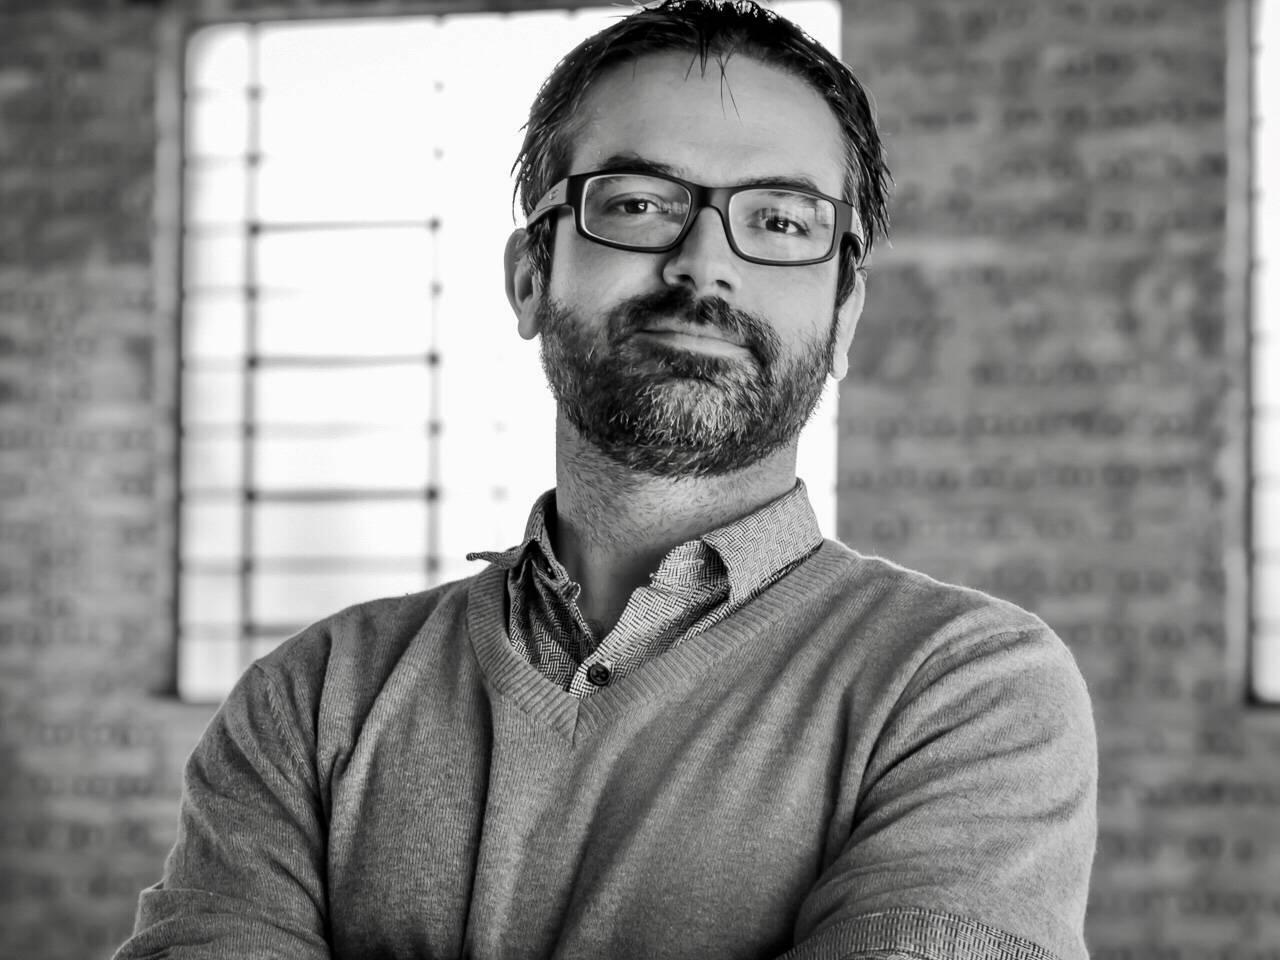 Bruno Fabricio Lobo Pacheco